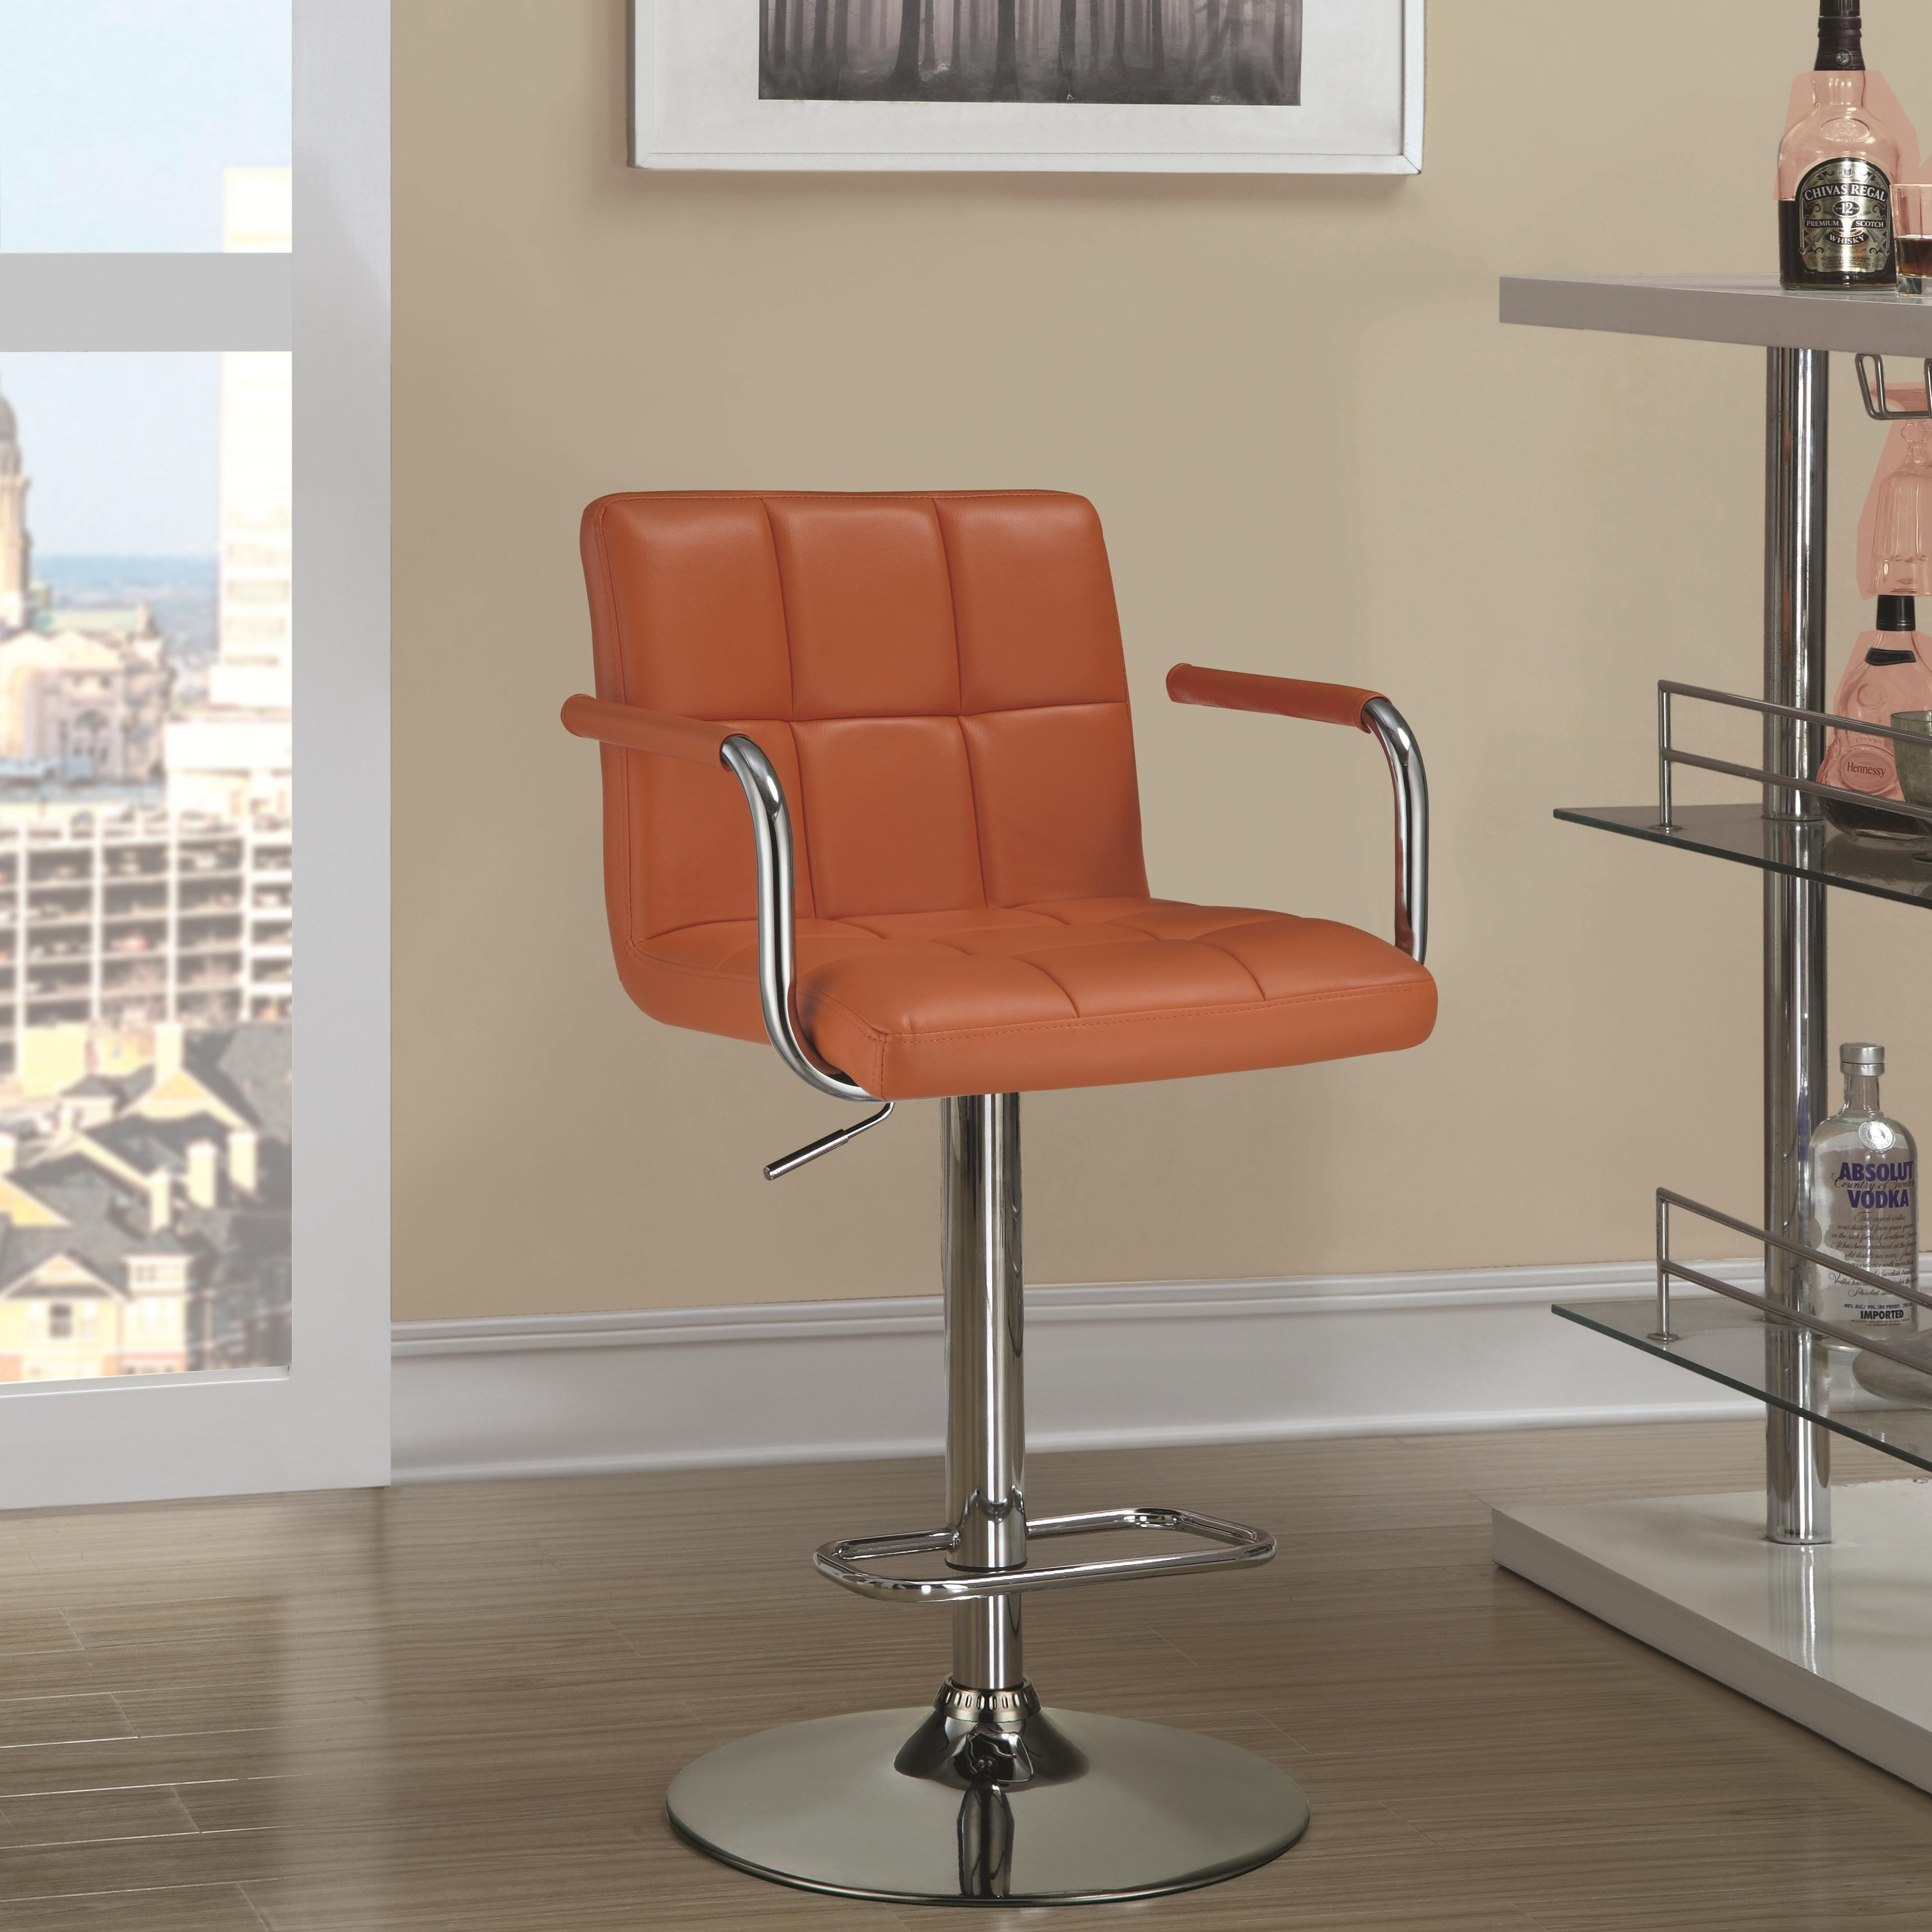 Coaster dining chairs and bar stools adjustable bar stool - Bright colored bar stools ...